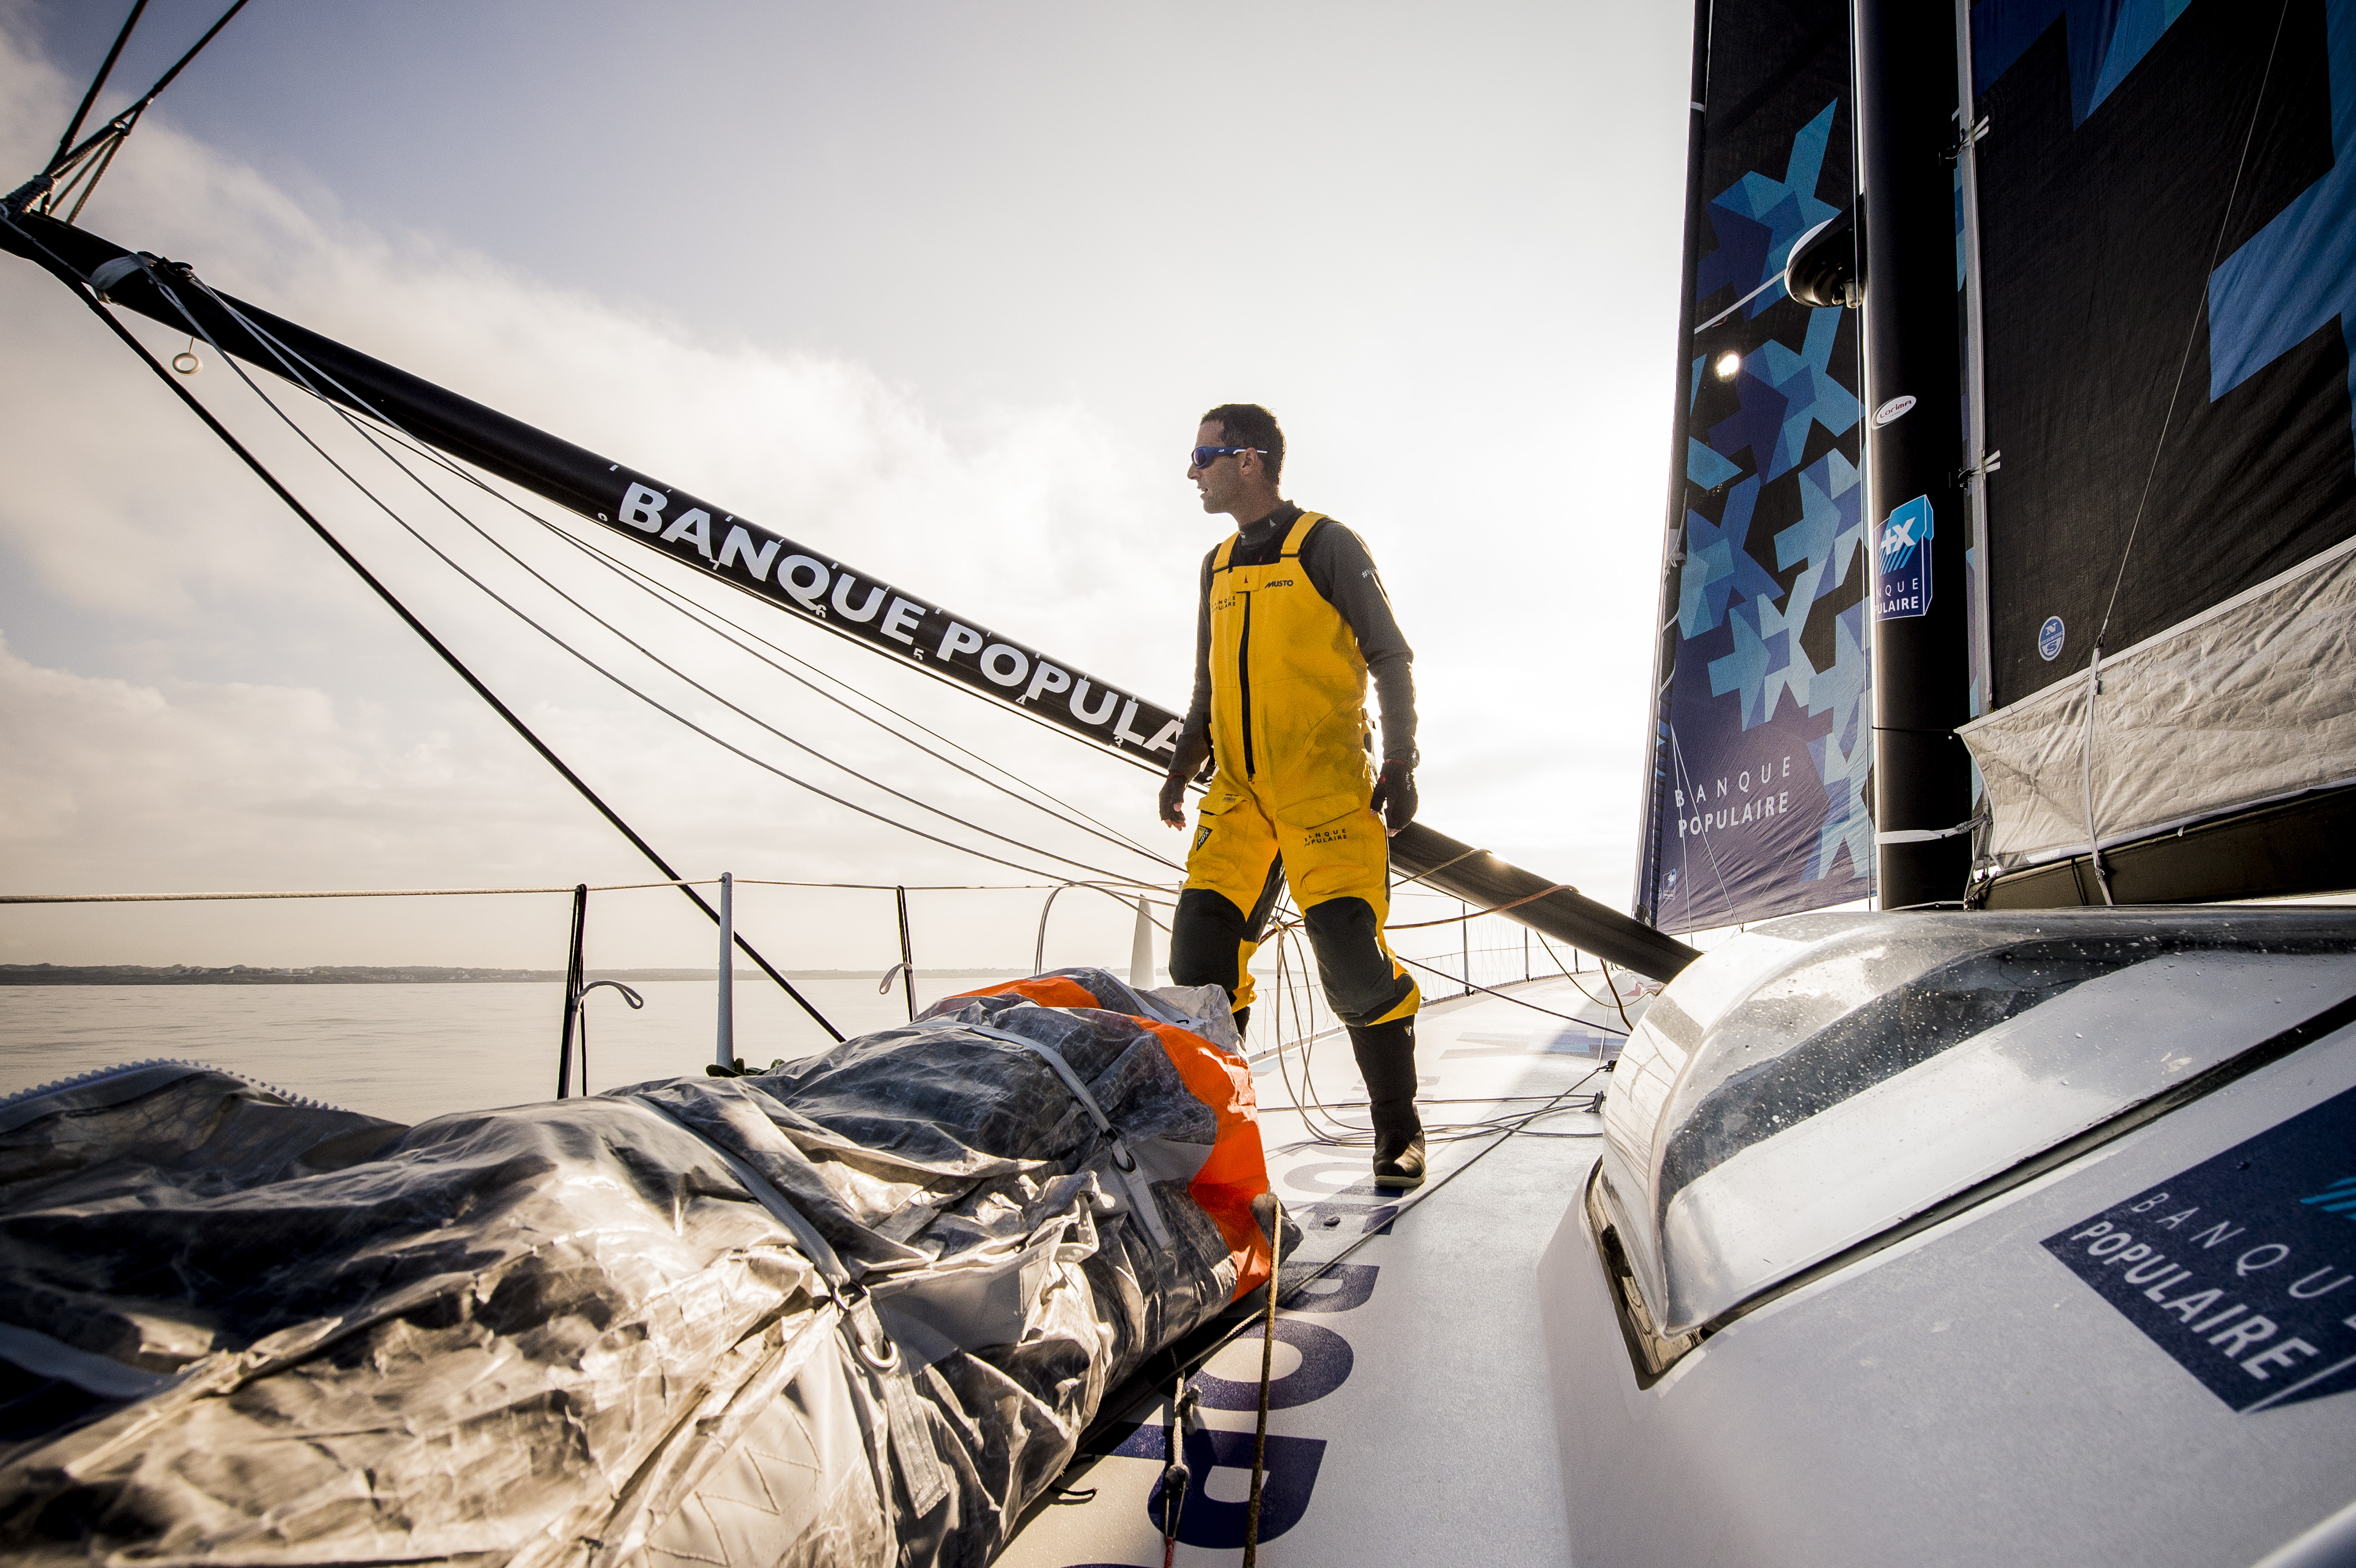 Mono BP VIII BI embarquée Vendée Globe 2016_copyright V.Curutchet - BPCE